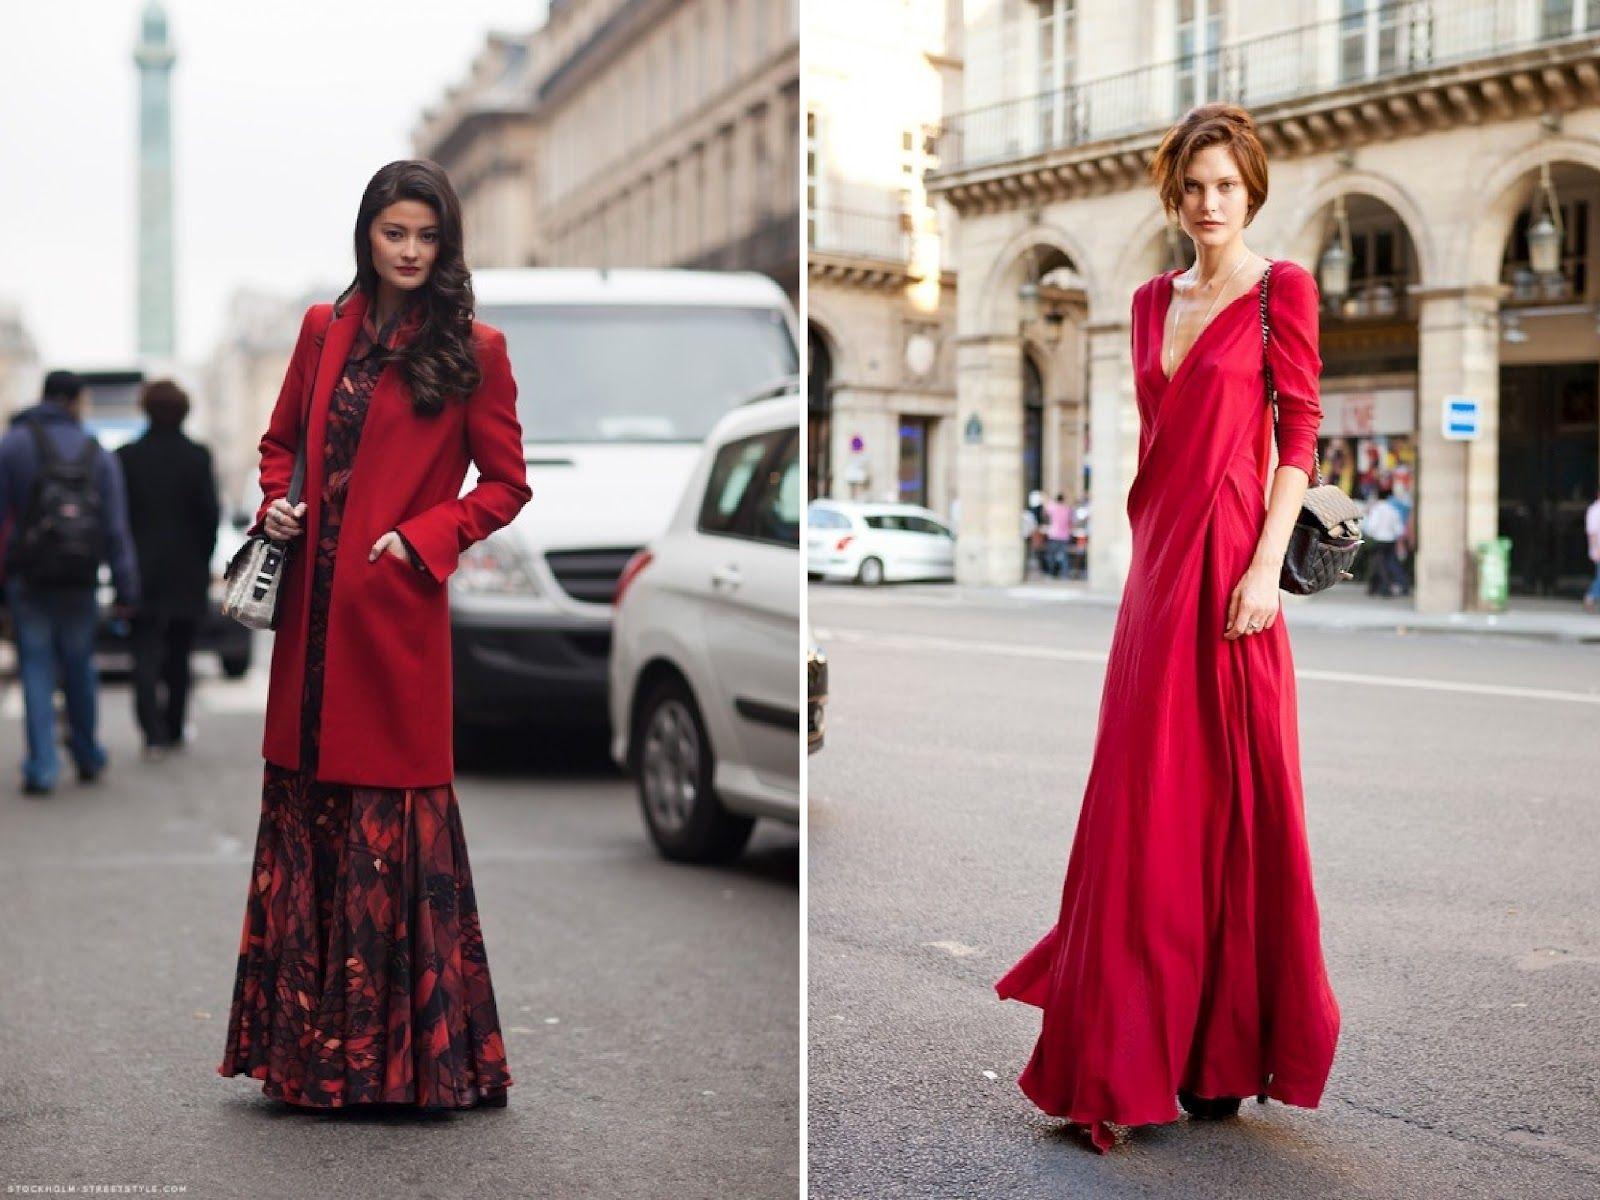 #Daring risk takers  #topshoppromqueen  Skirt Knit  #2dayslook #SkirtKnit #fashion #new  www.2dayslook.com